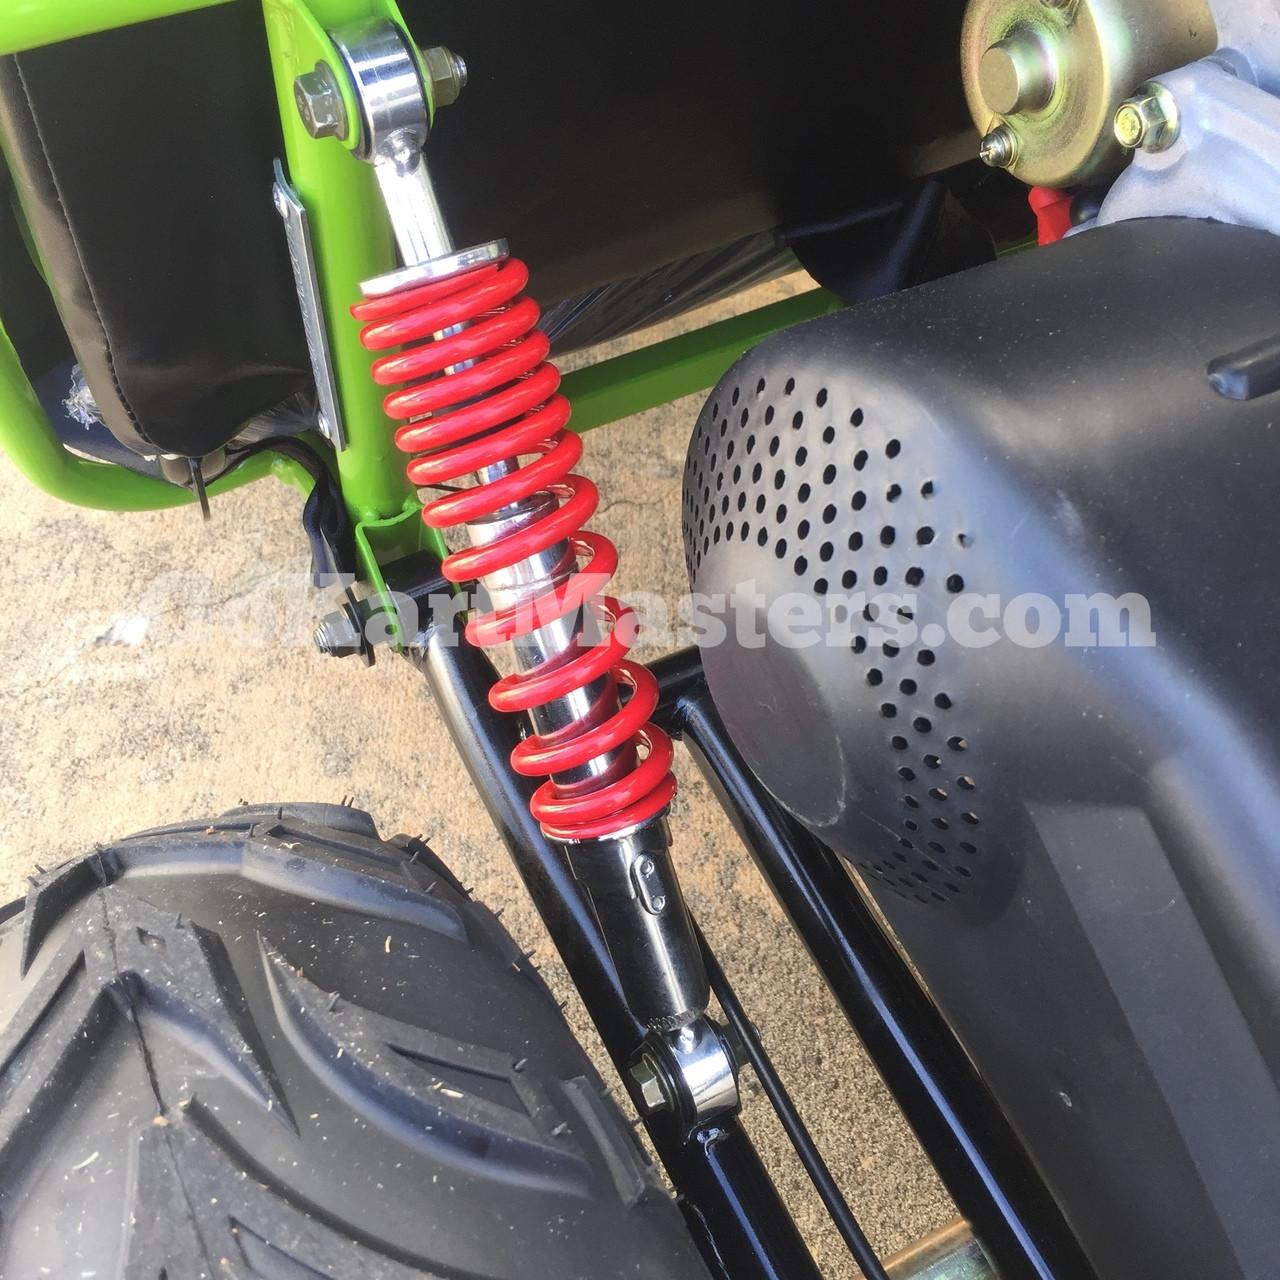 TrailMaster Mini XRX/R+ Go Kart - Rear Suspension